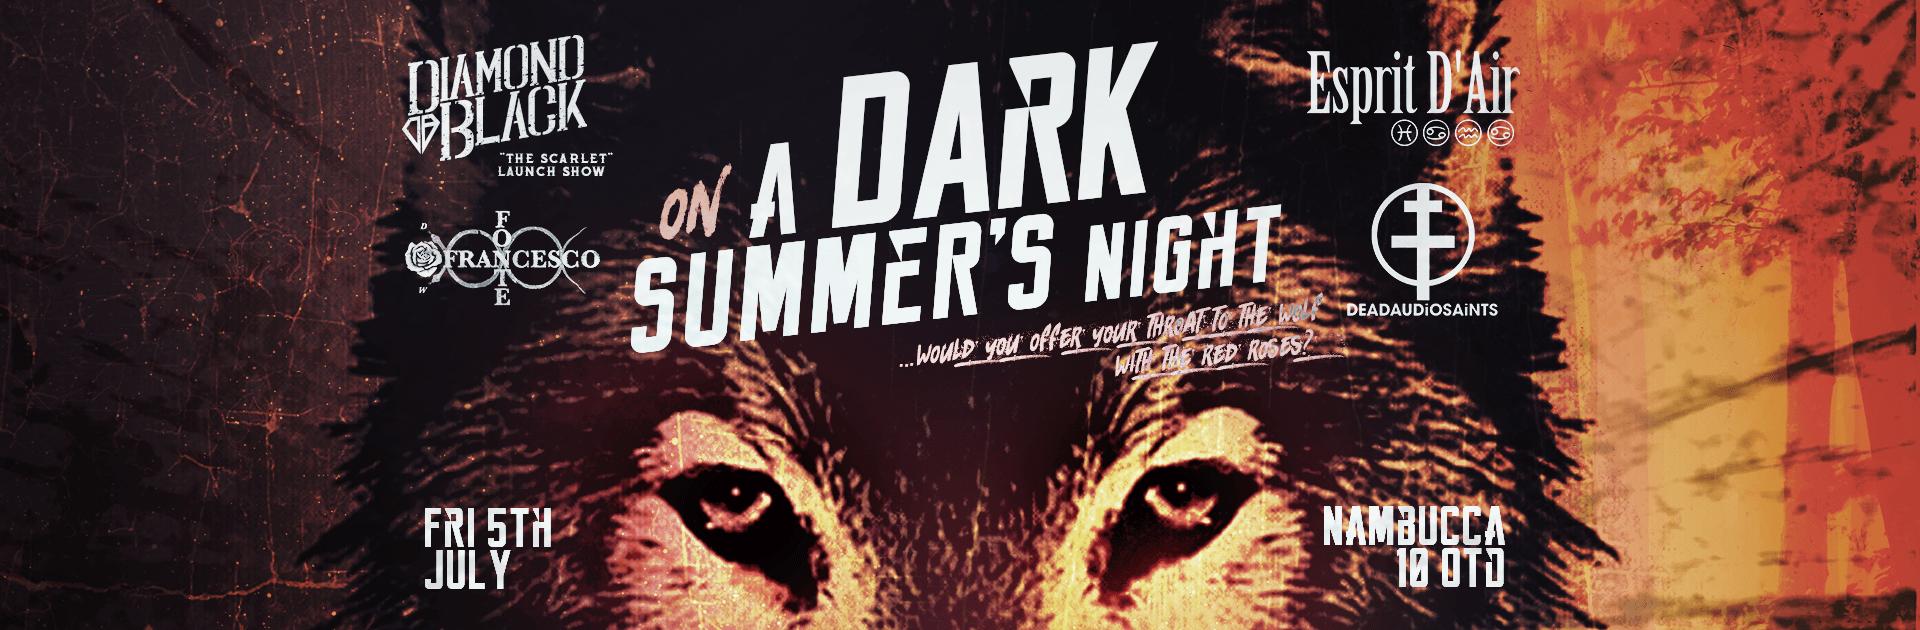 002 Darksummersnight Fb